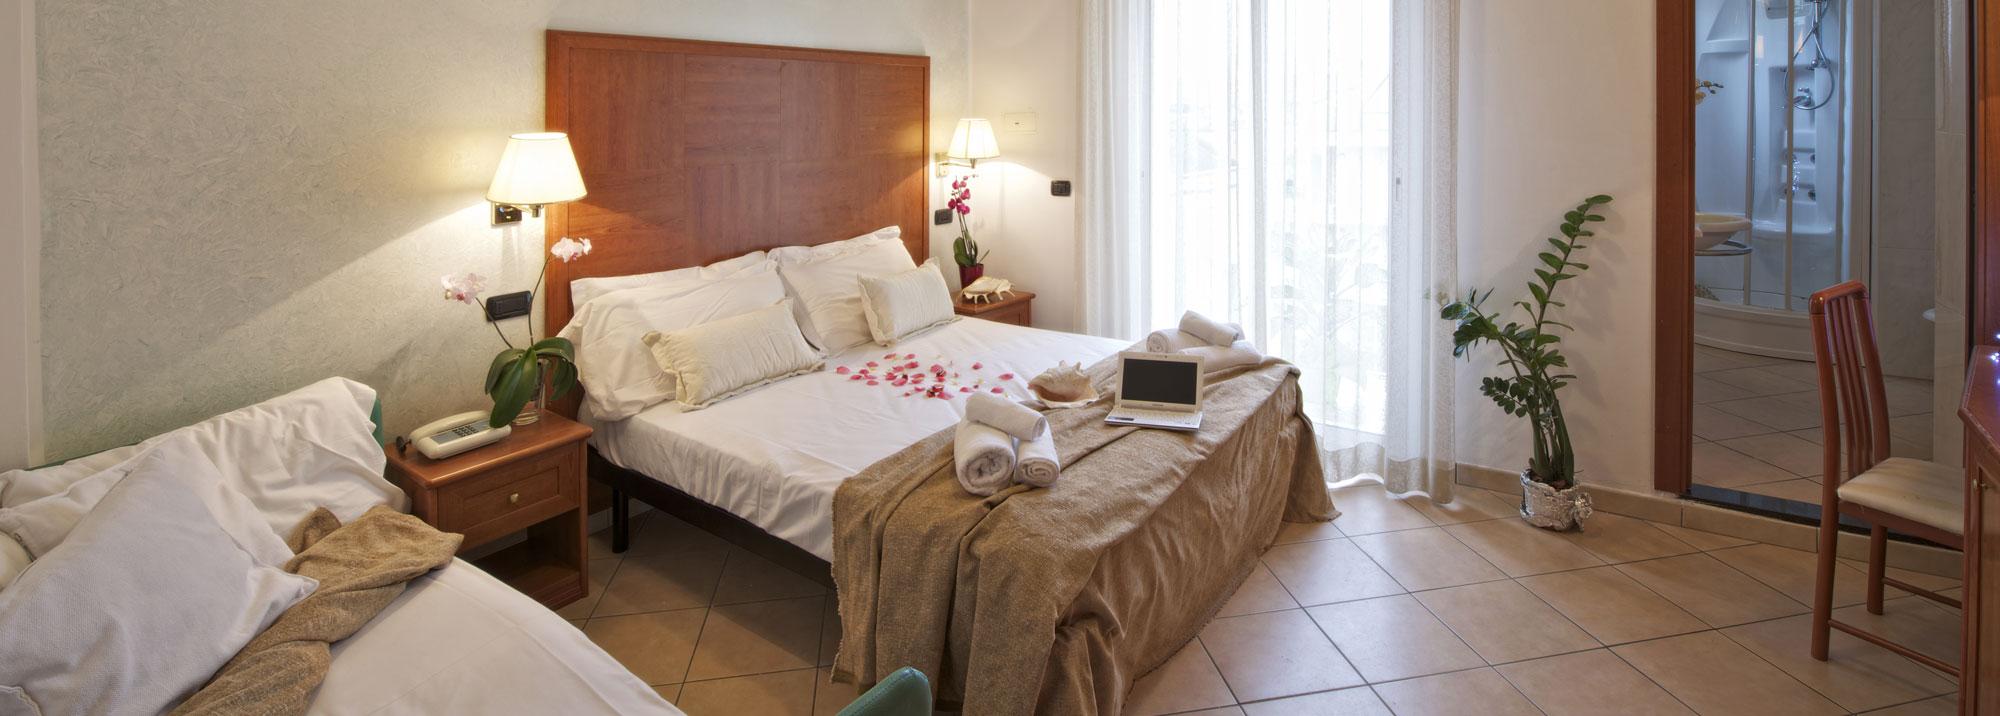 Hotel Lido Cattolica camere grandi